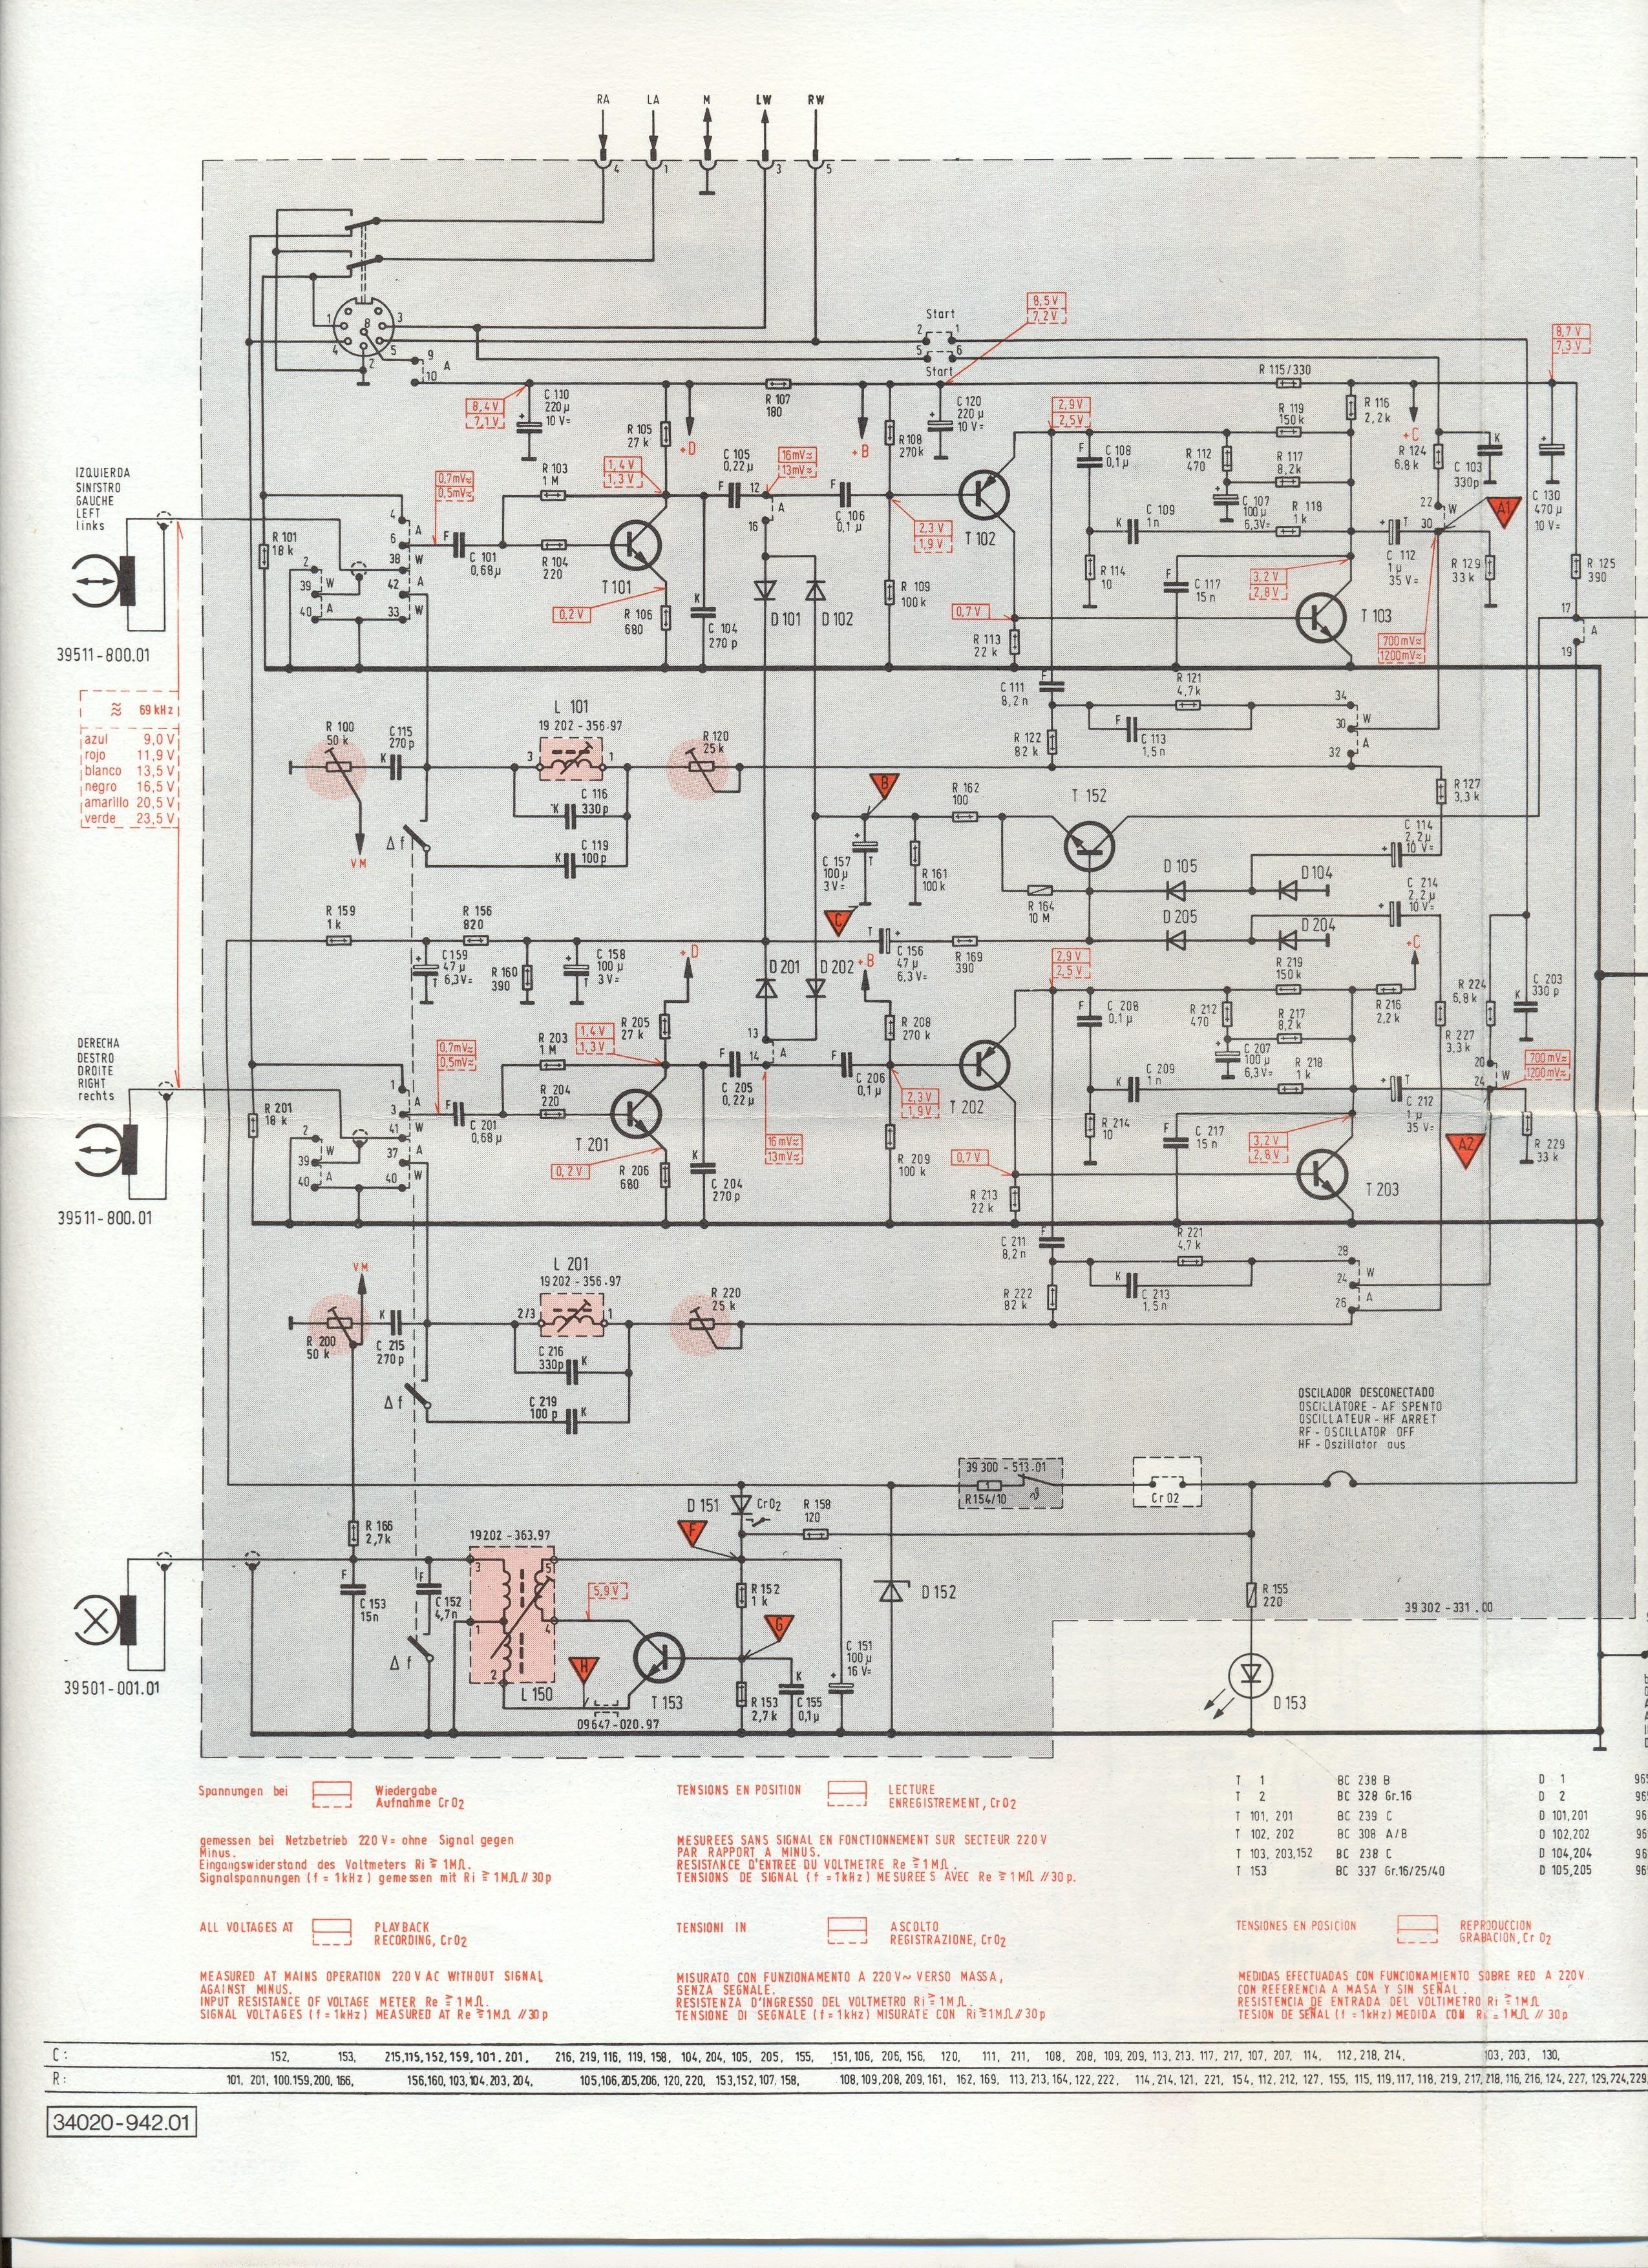 Grundig Studio 3010 - Cassette - 01